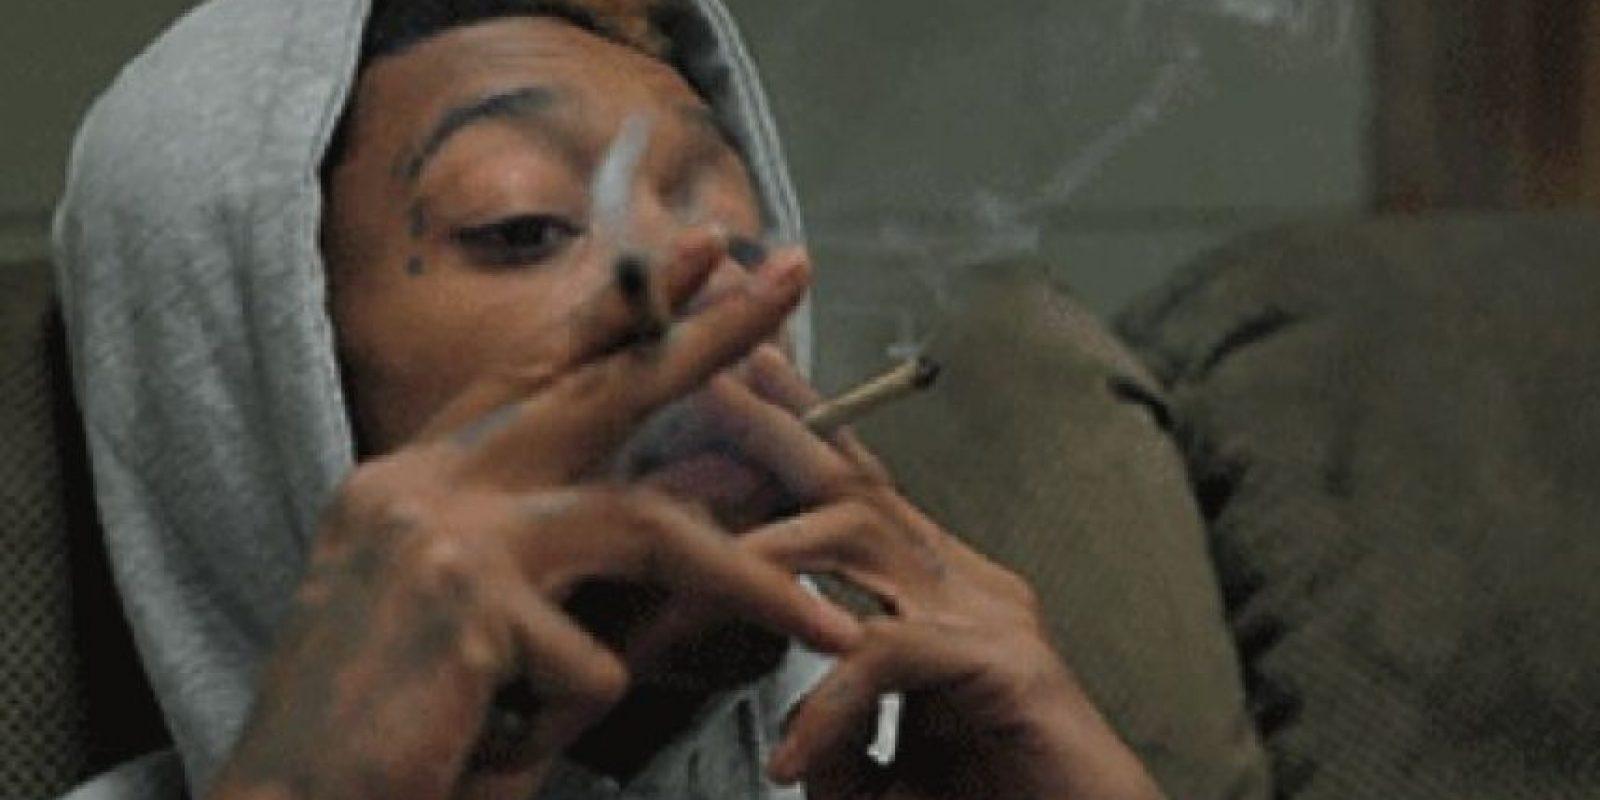 4. La marihuana tiene un uso medicinal contra el cáncer. Foto:Tumble.com/Tagged-marihuana